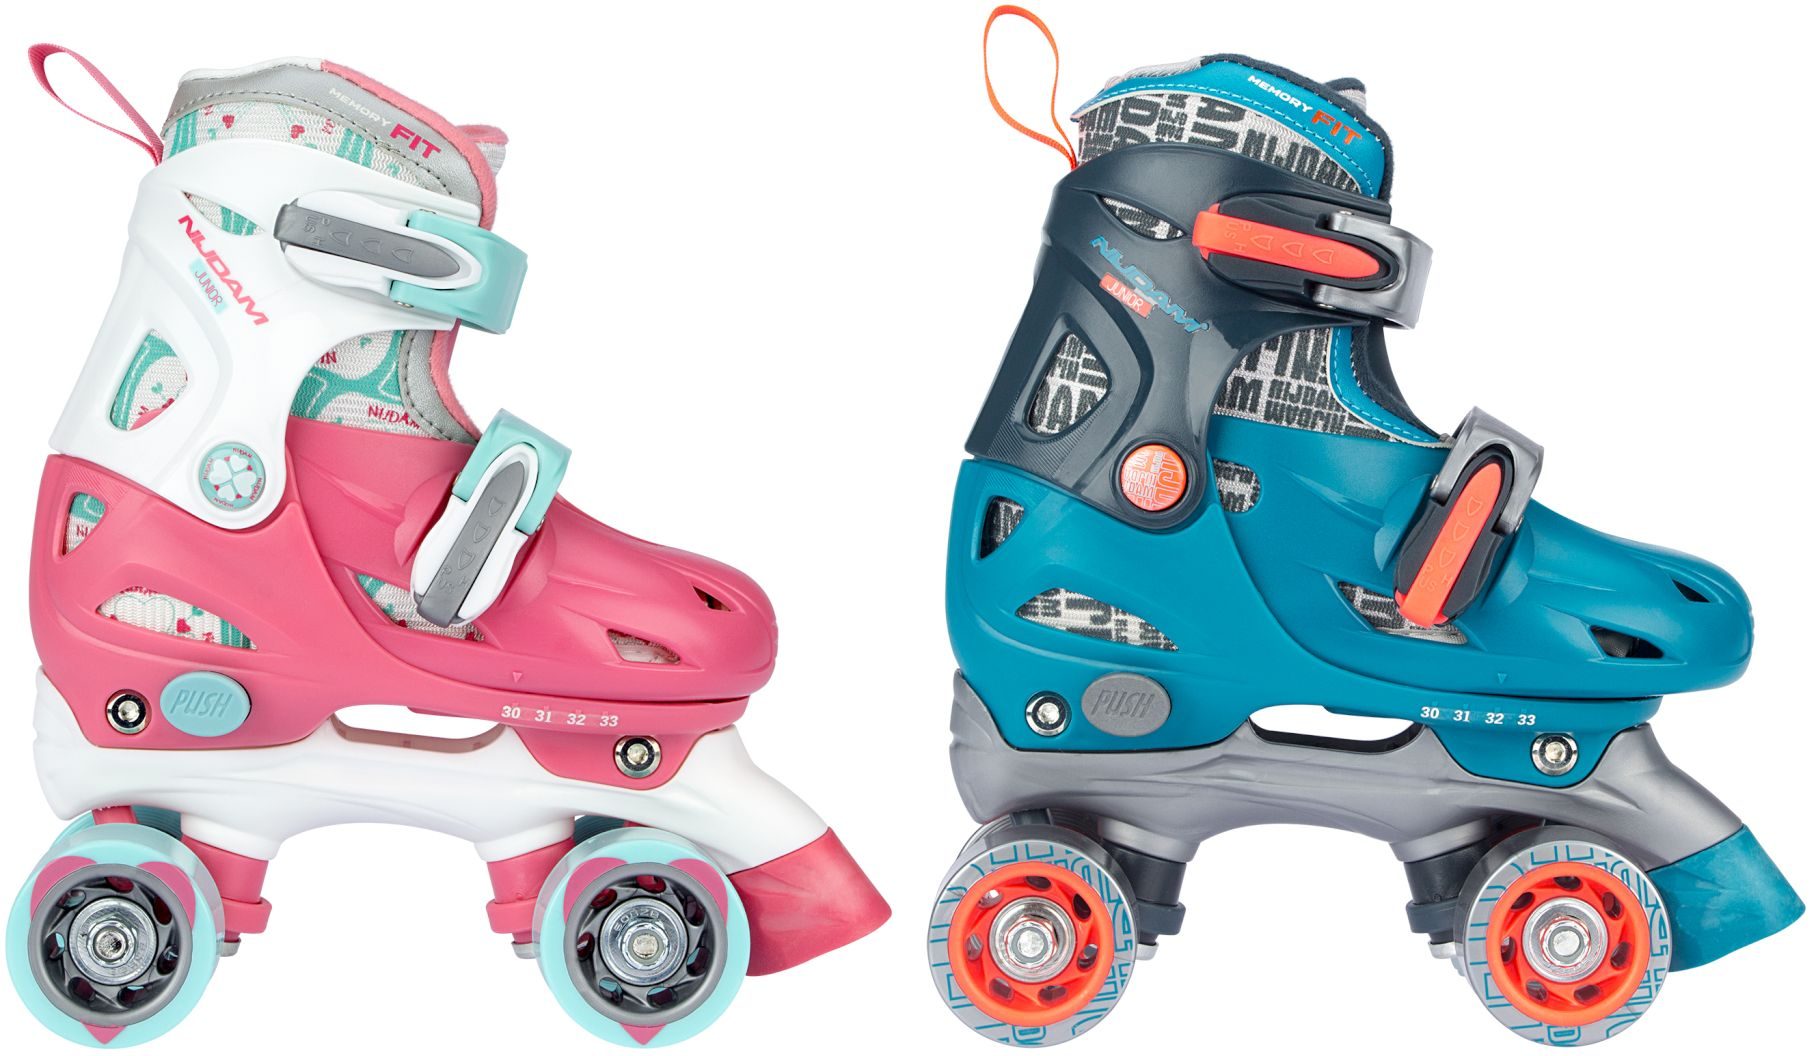 44f5fa94f09 52QN - Roller Skates Junior Adjustable Hardboot • Disco Twirl ...